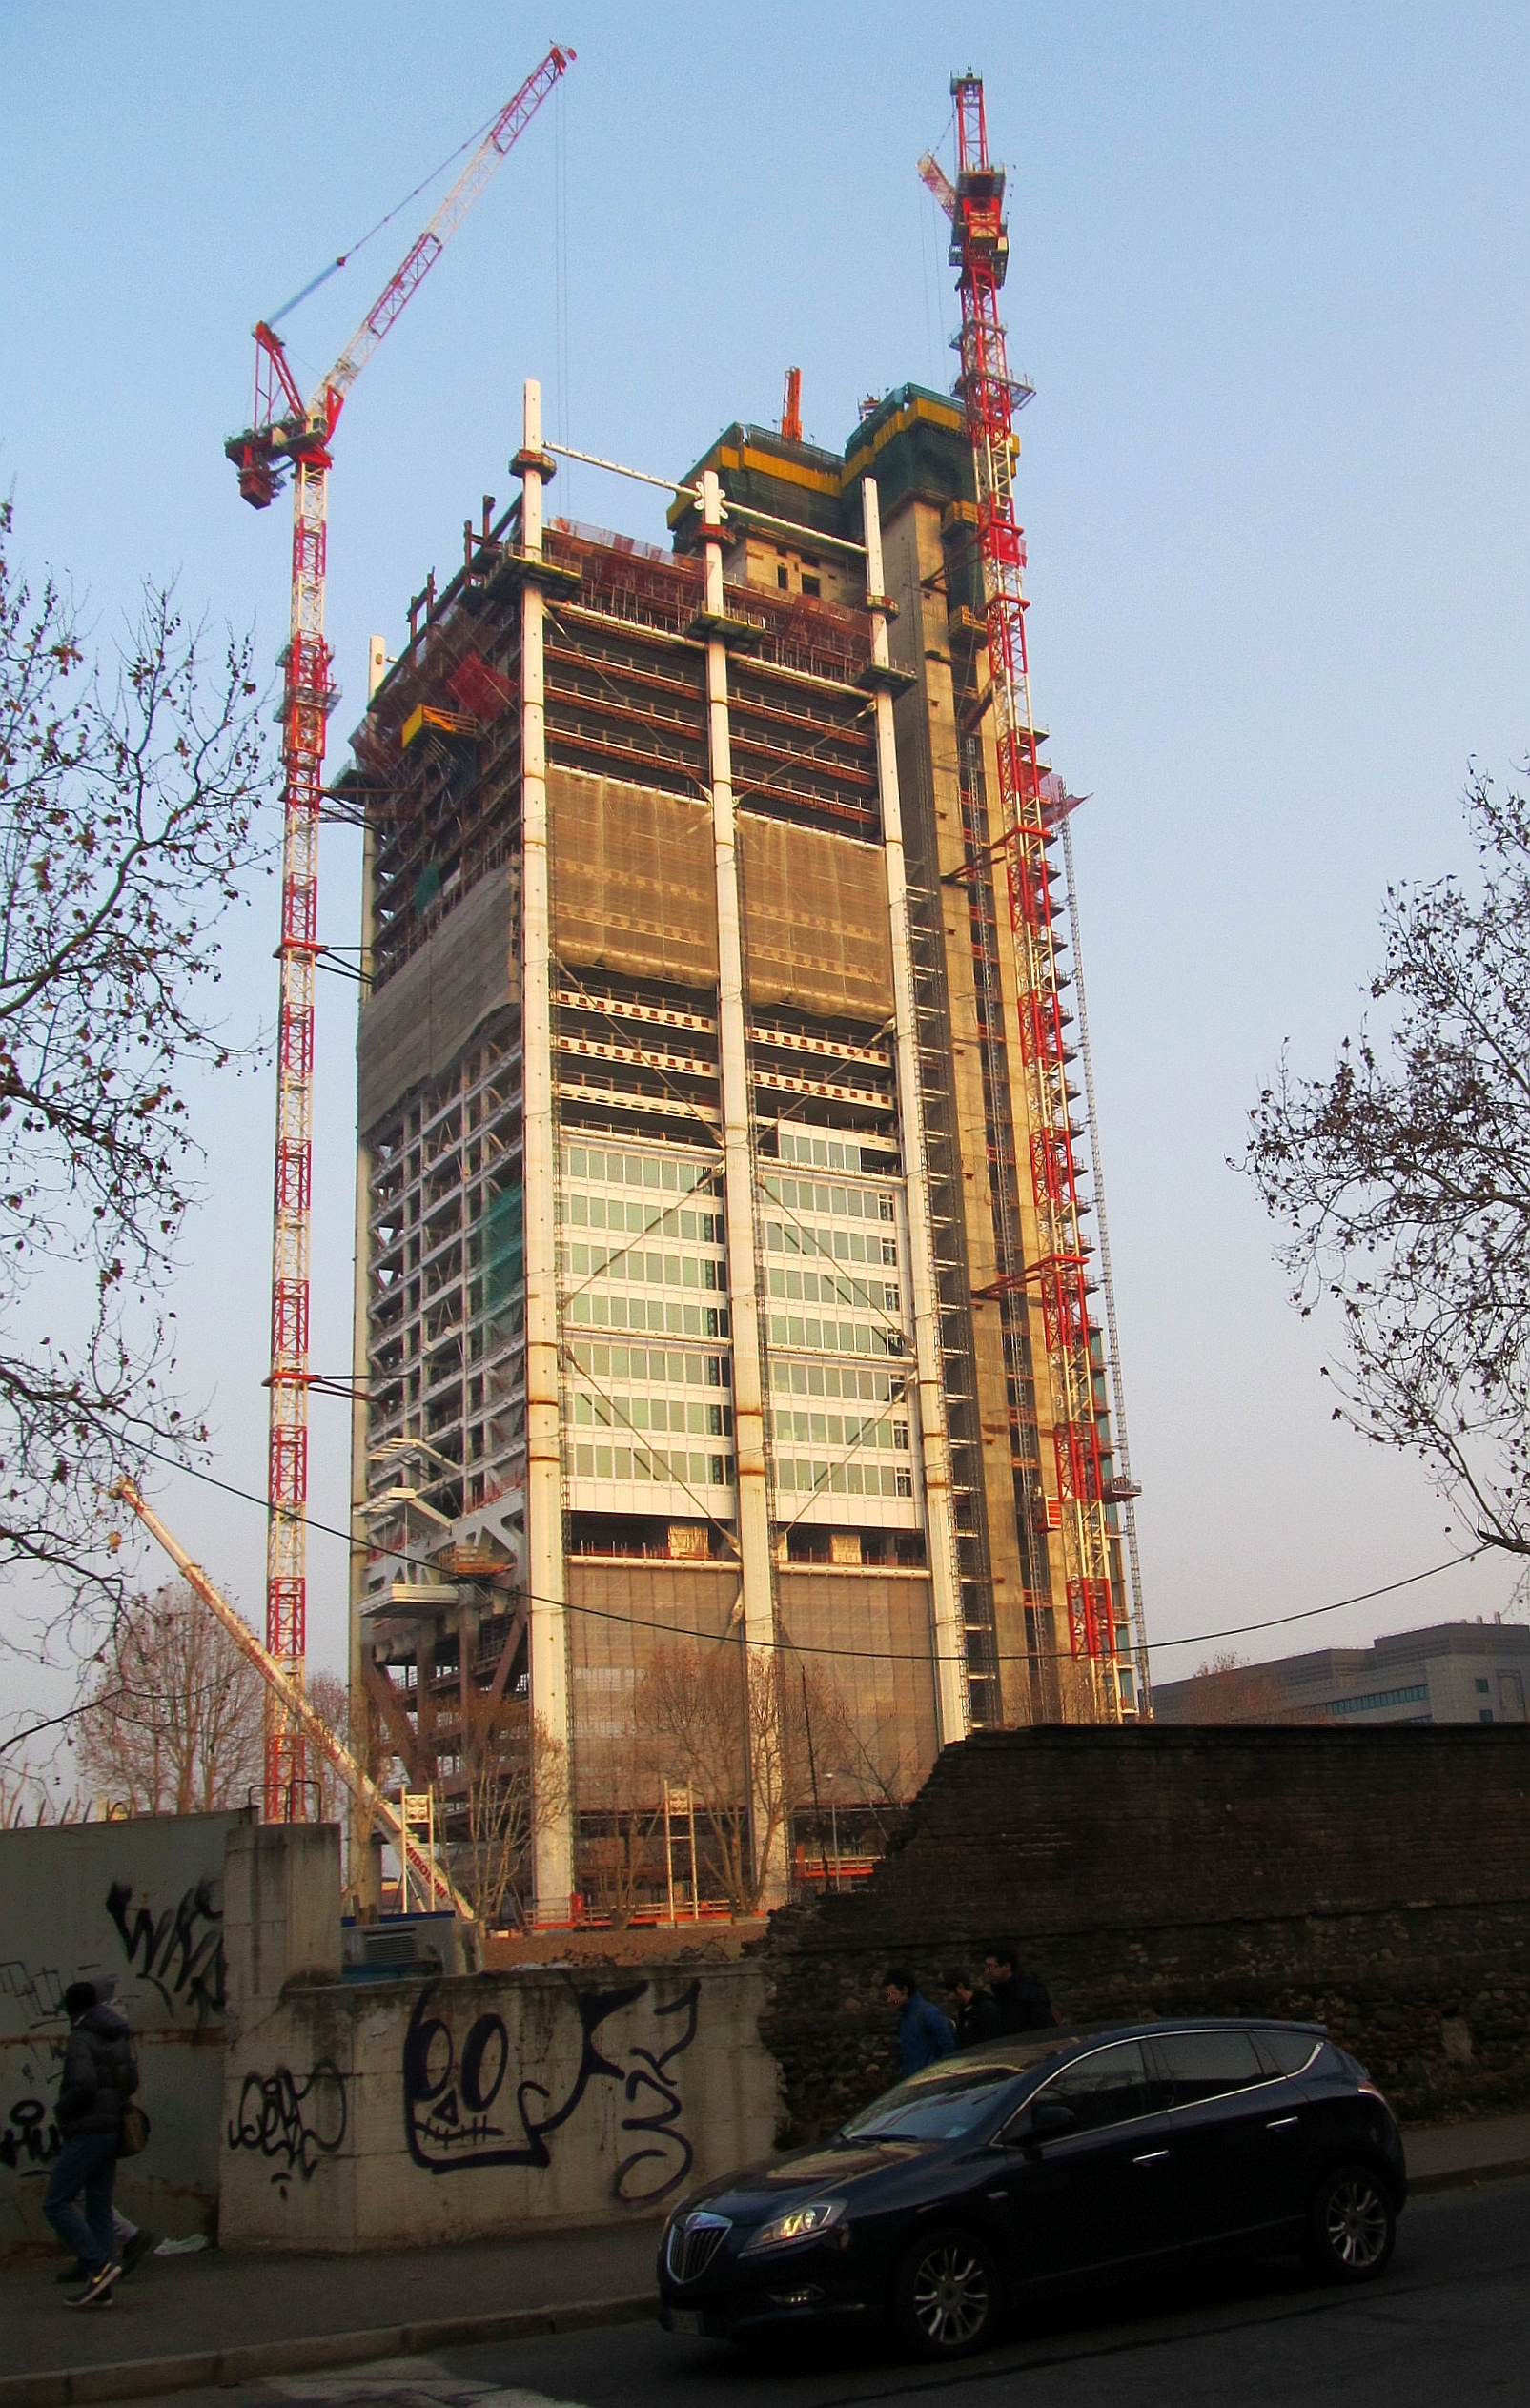 Grattacielo Intesa Sanpaolo Grattacielo Intesa Sanpaolo